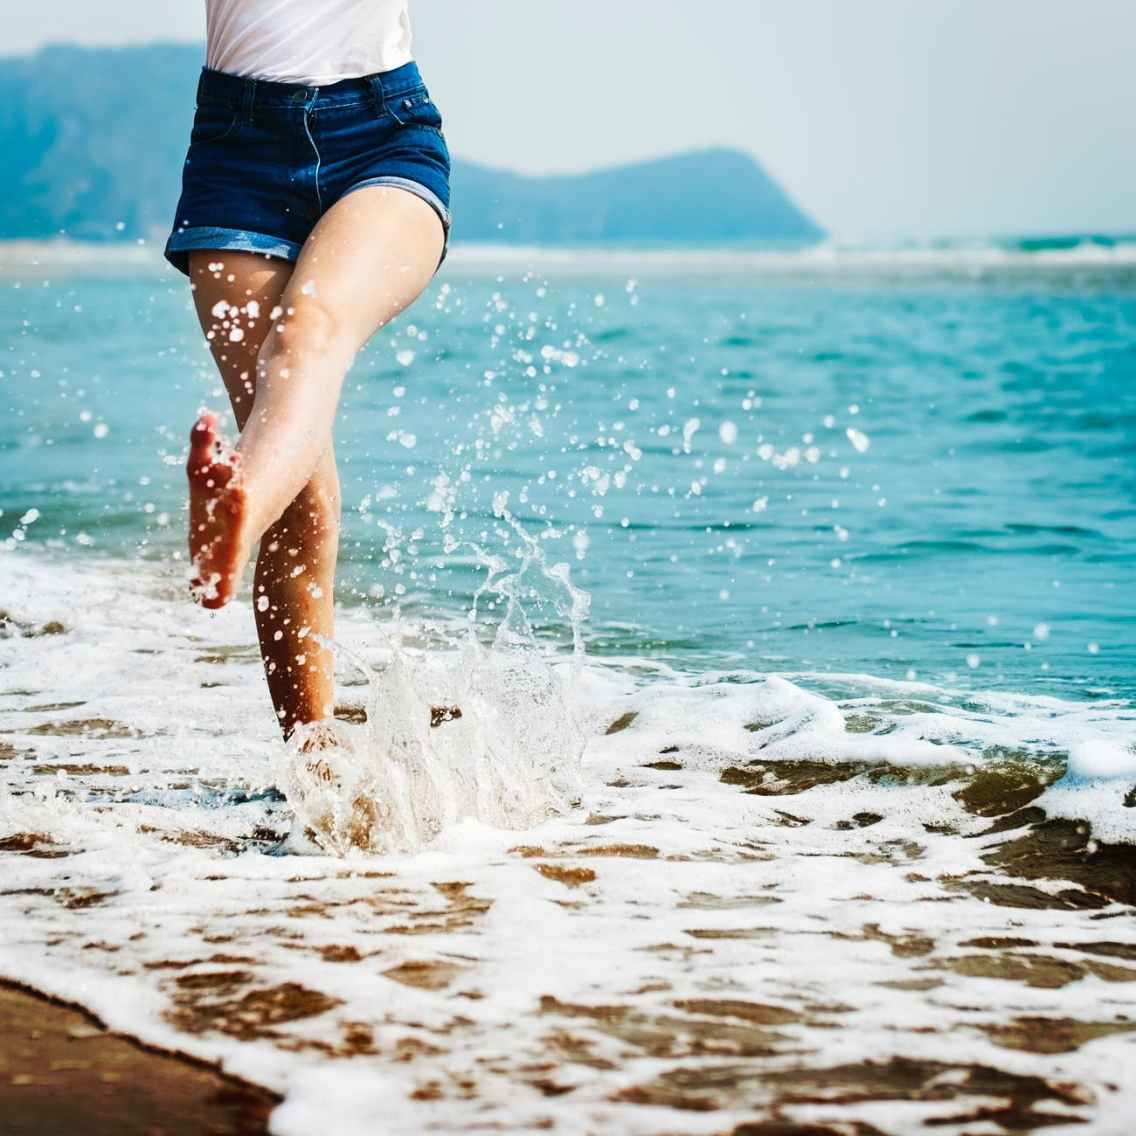 Great things happen when you choose joy.